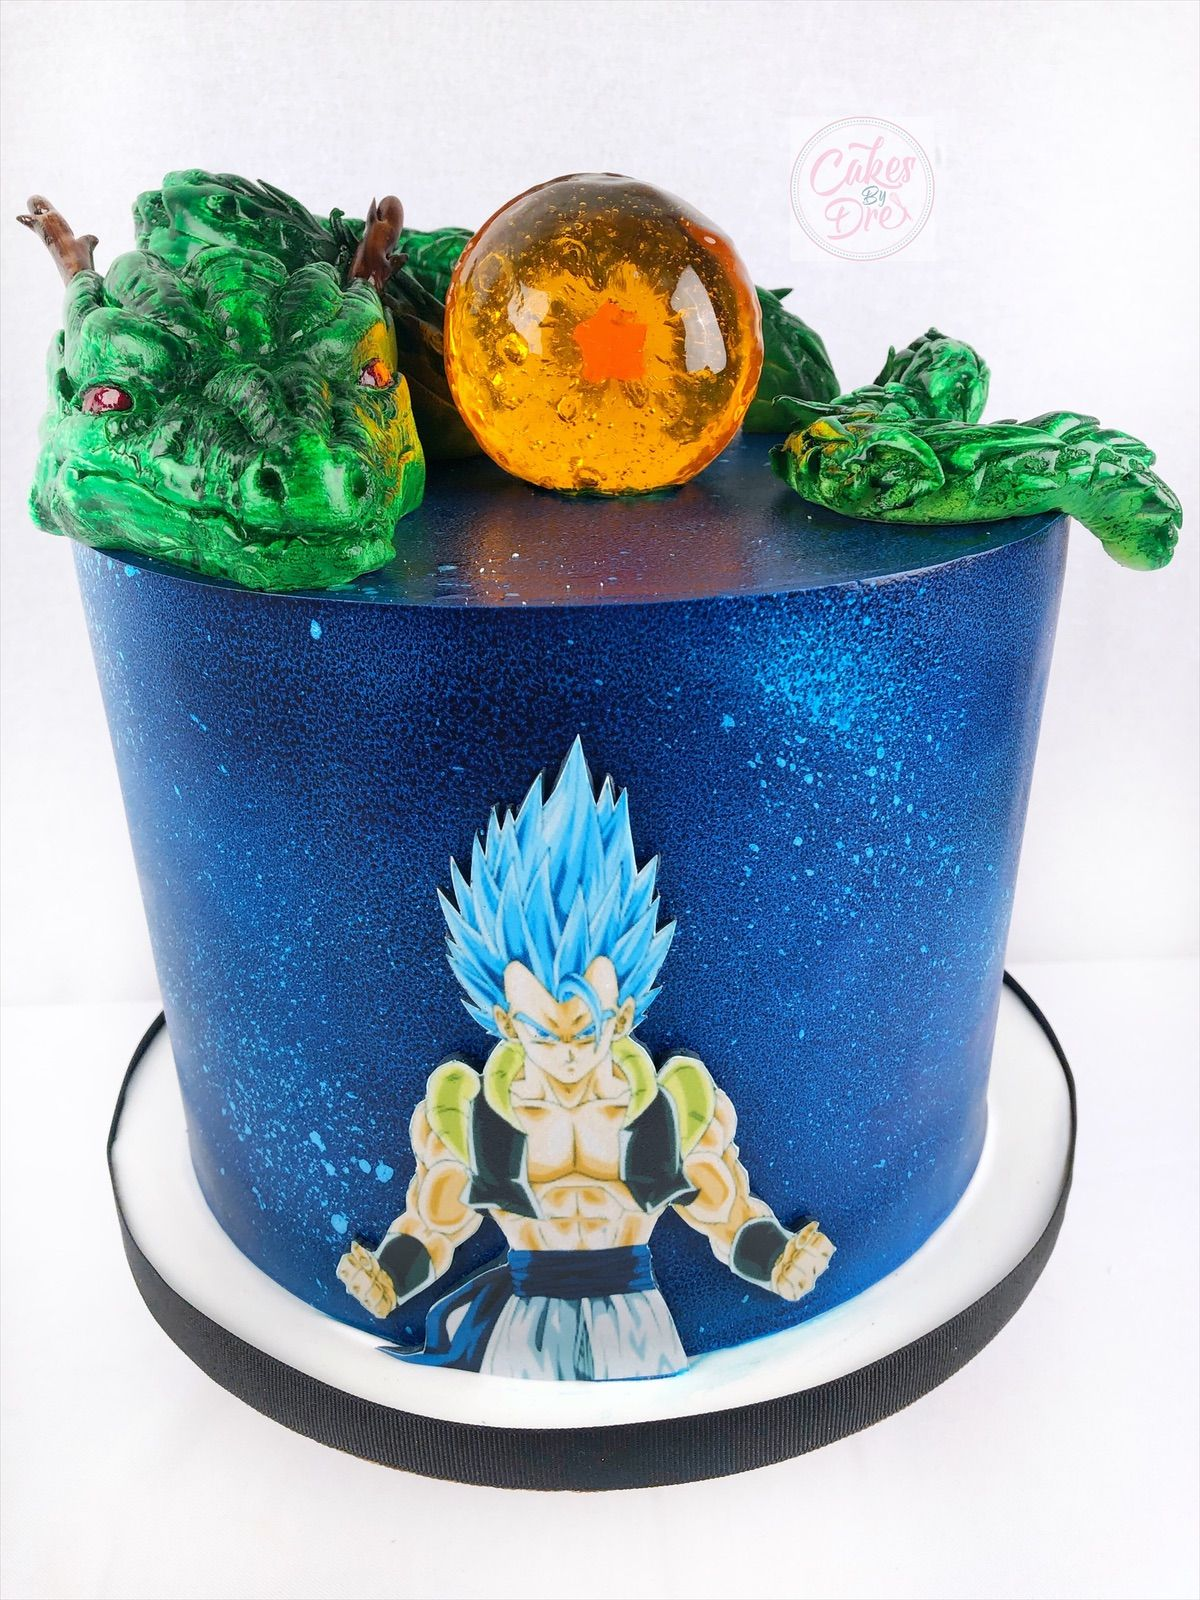 Dragon Ball Z Cake Dragonball Z Cake Drop Cake Celebration Cakes